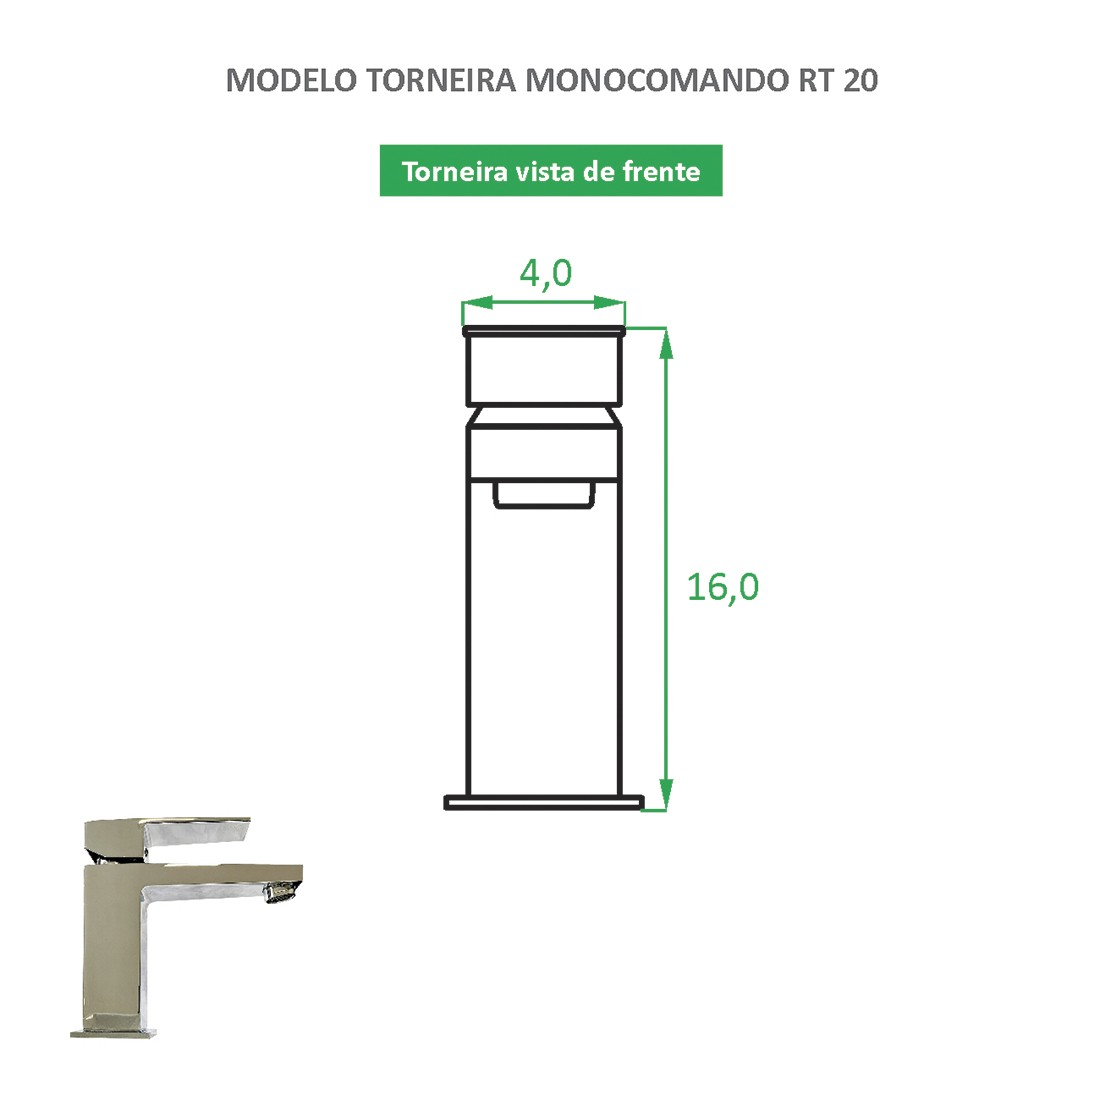 Torneira Monocomando Quadrada RT 20